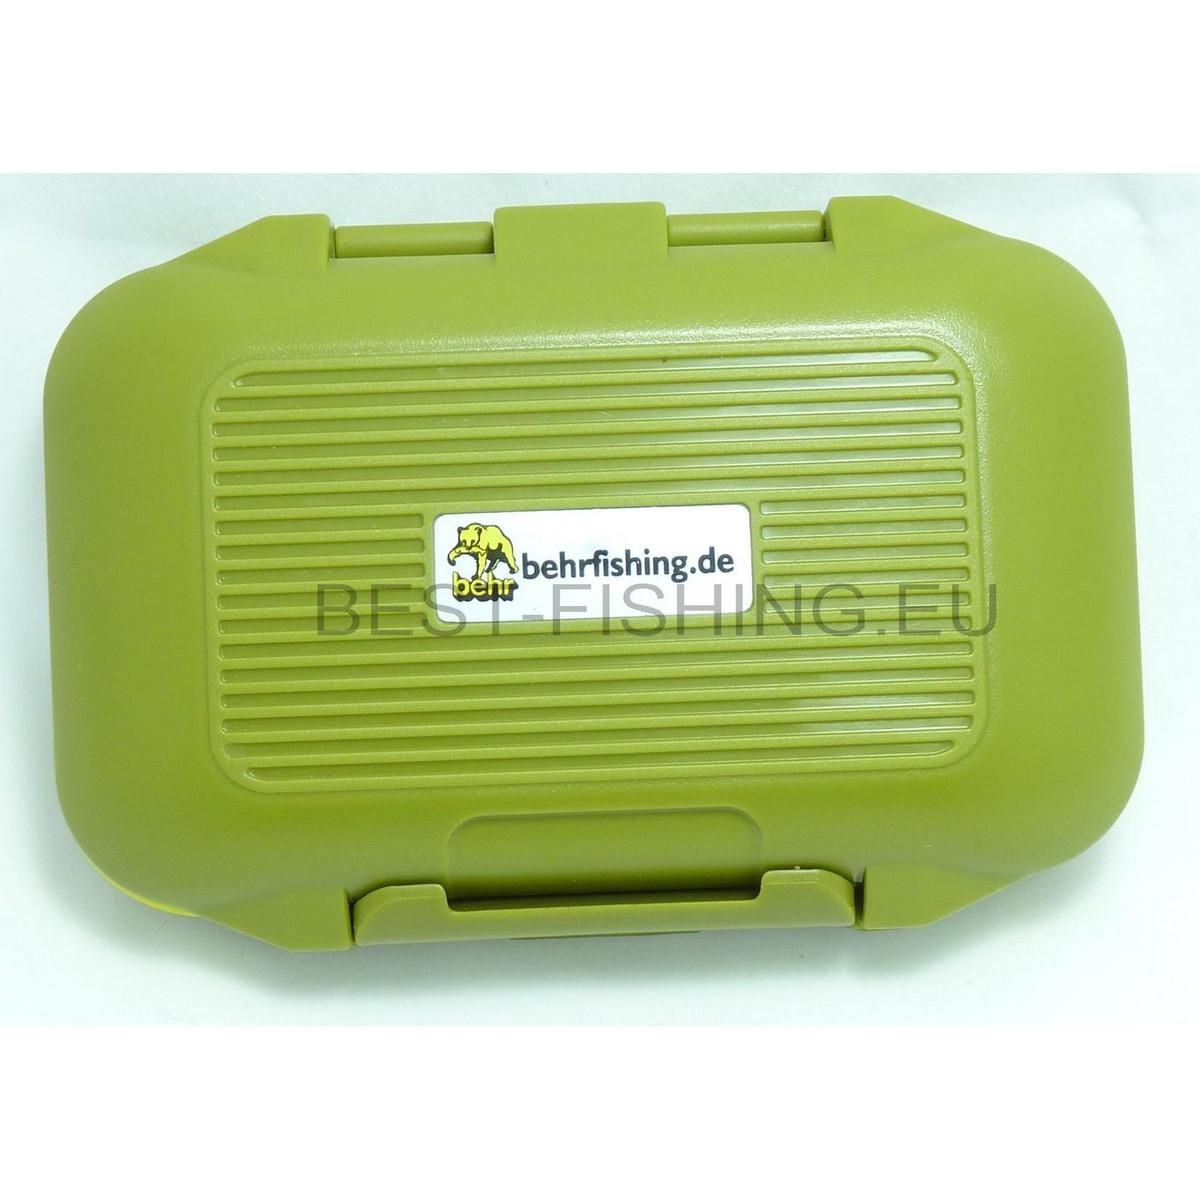 Кутия Behr мухарска 4620703